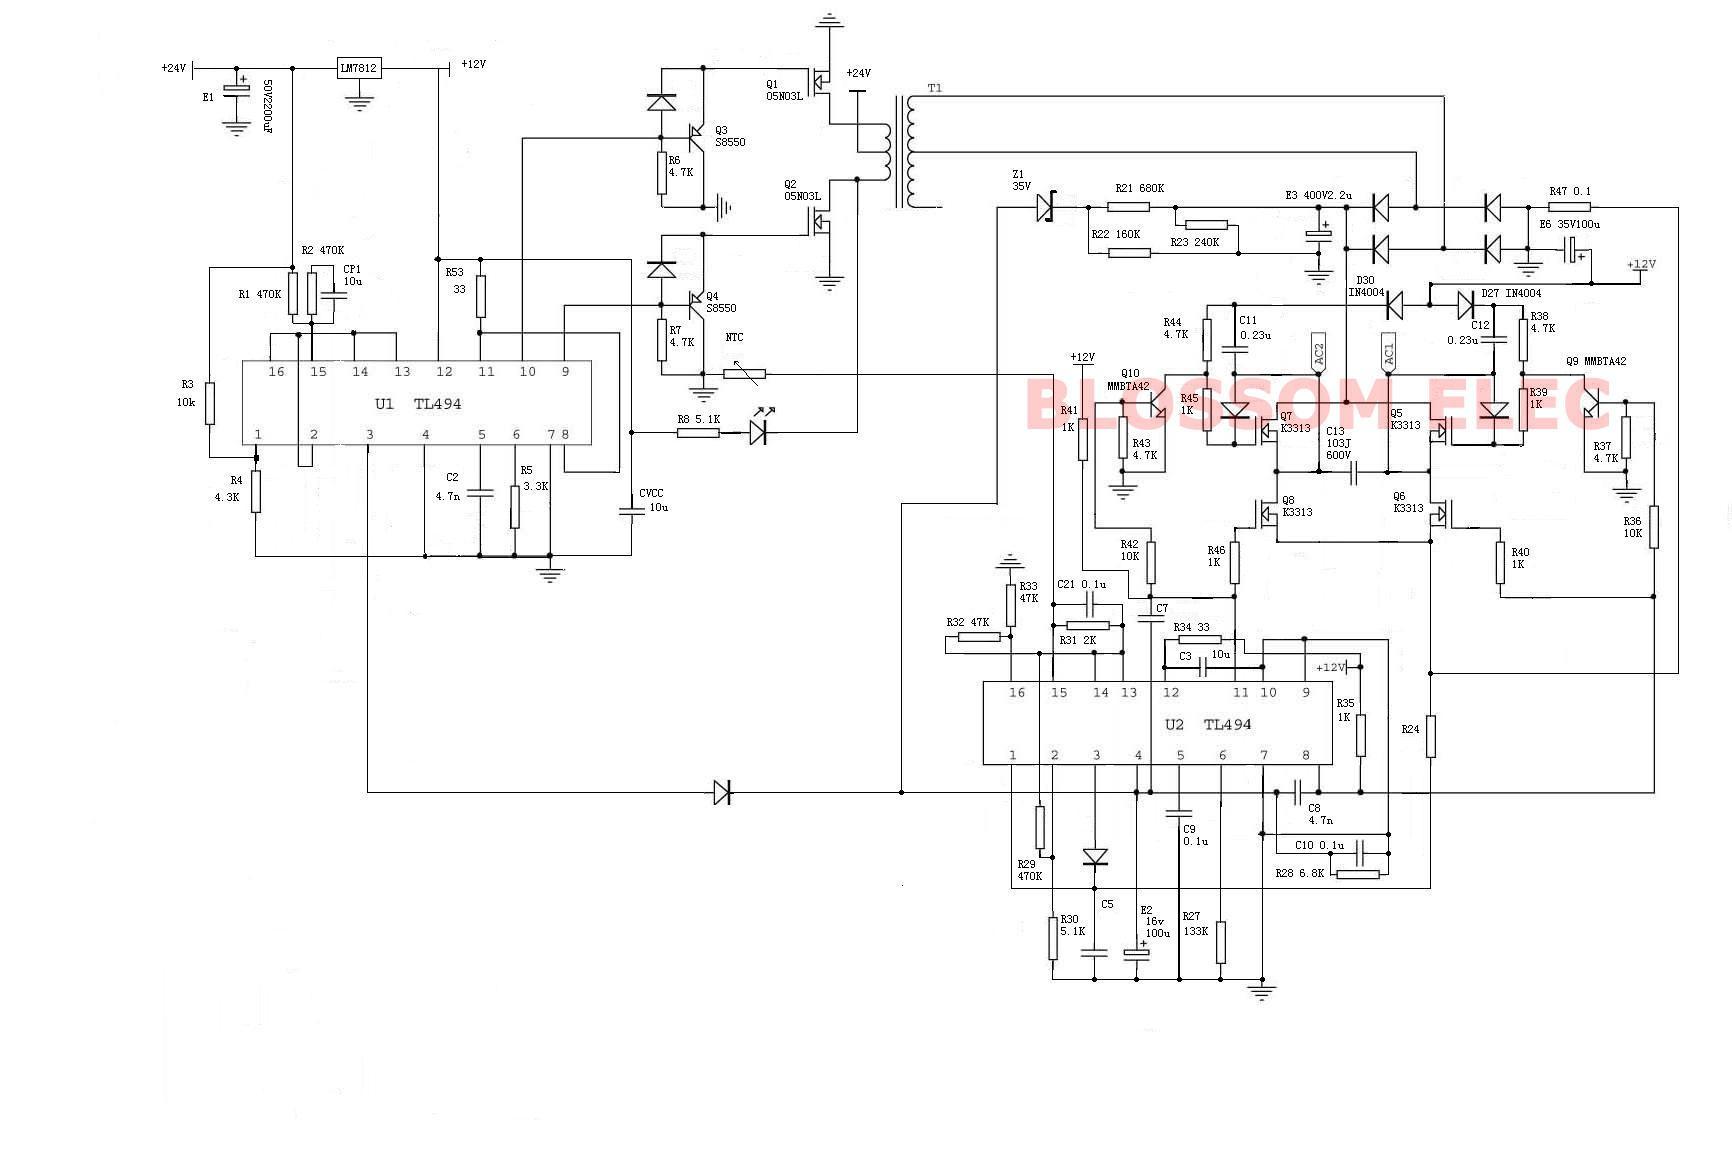 12v to 6v converter circuit diagram